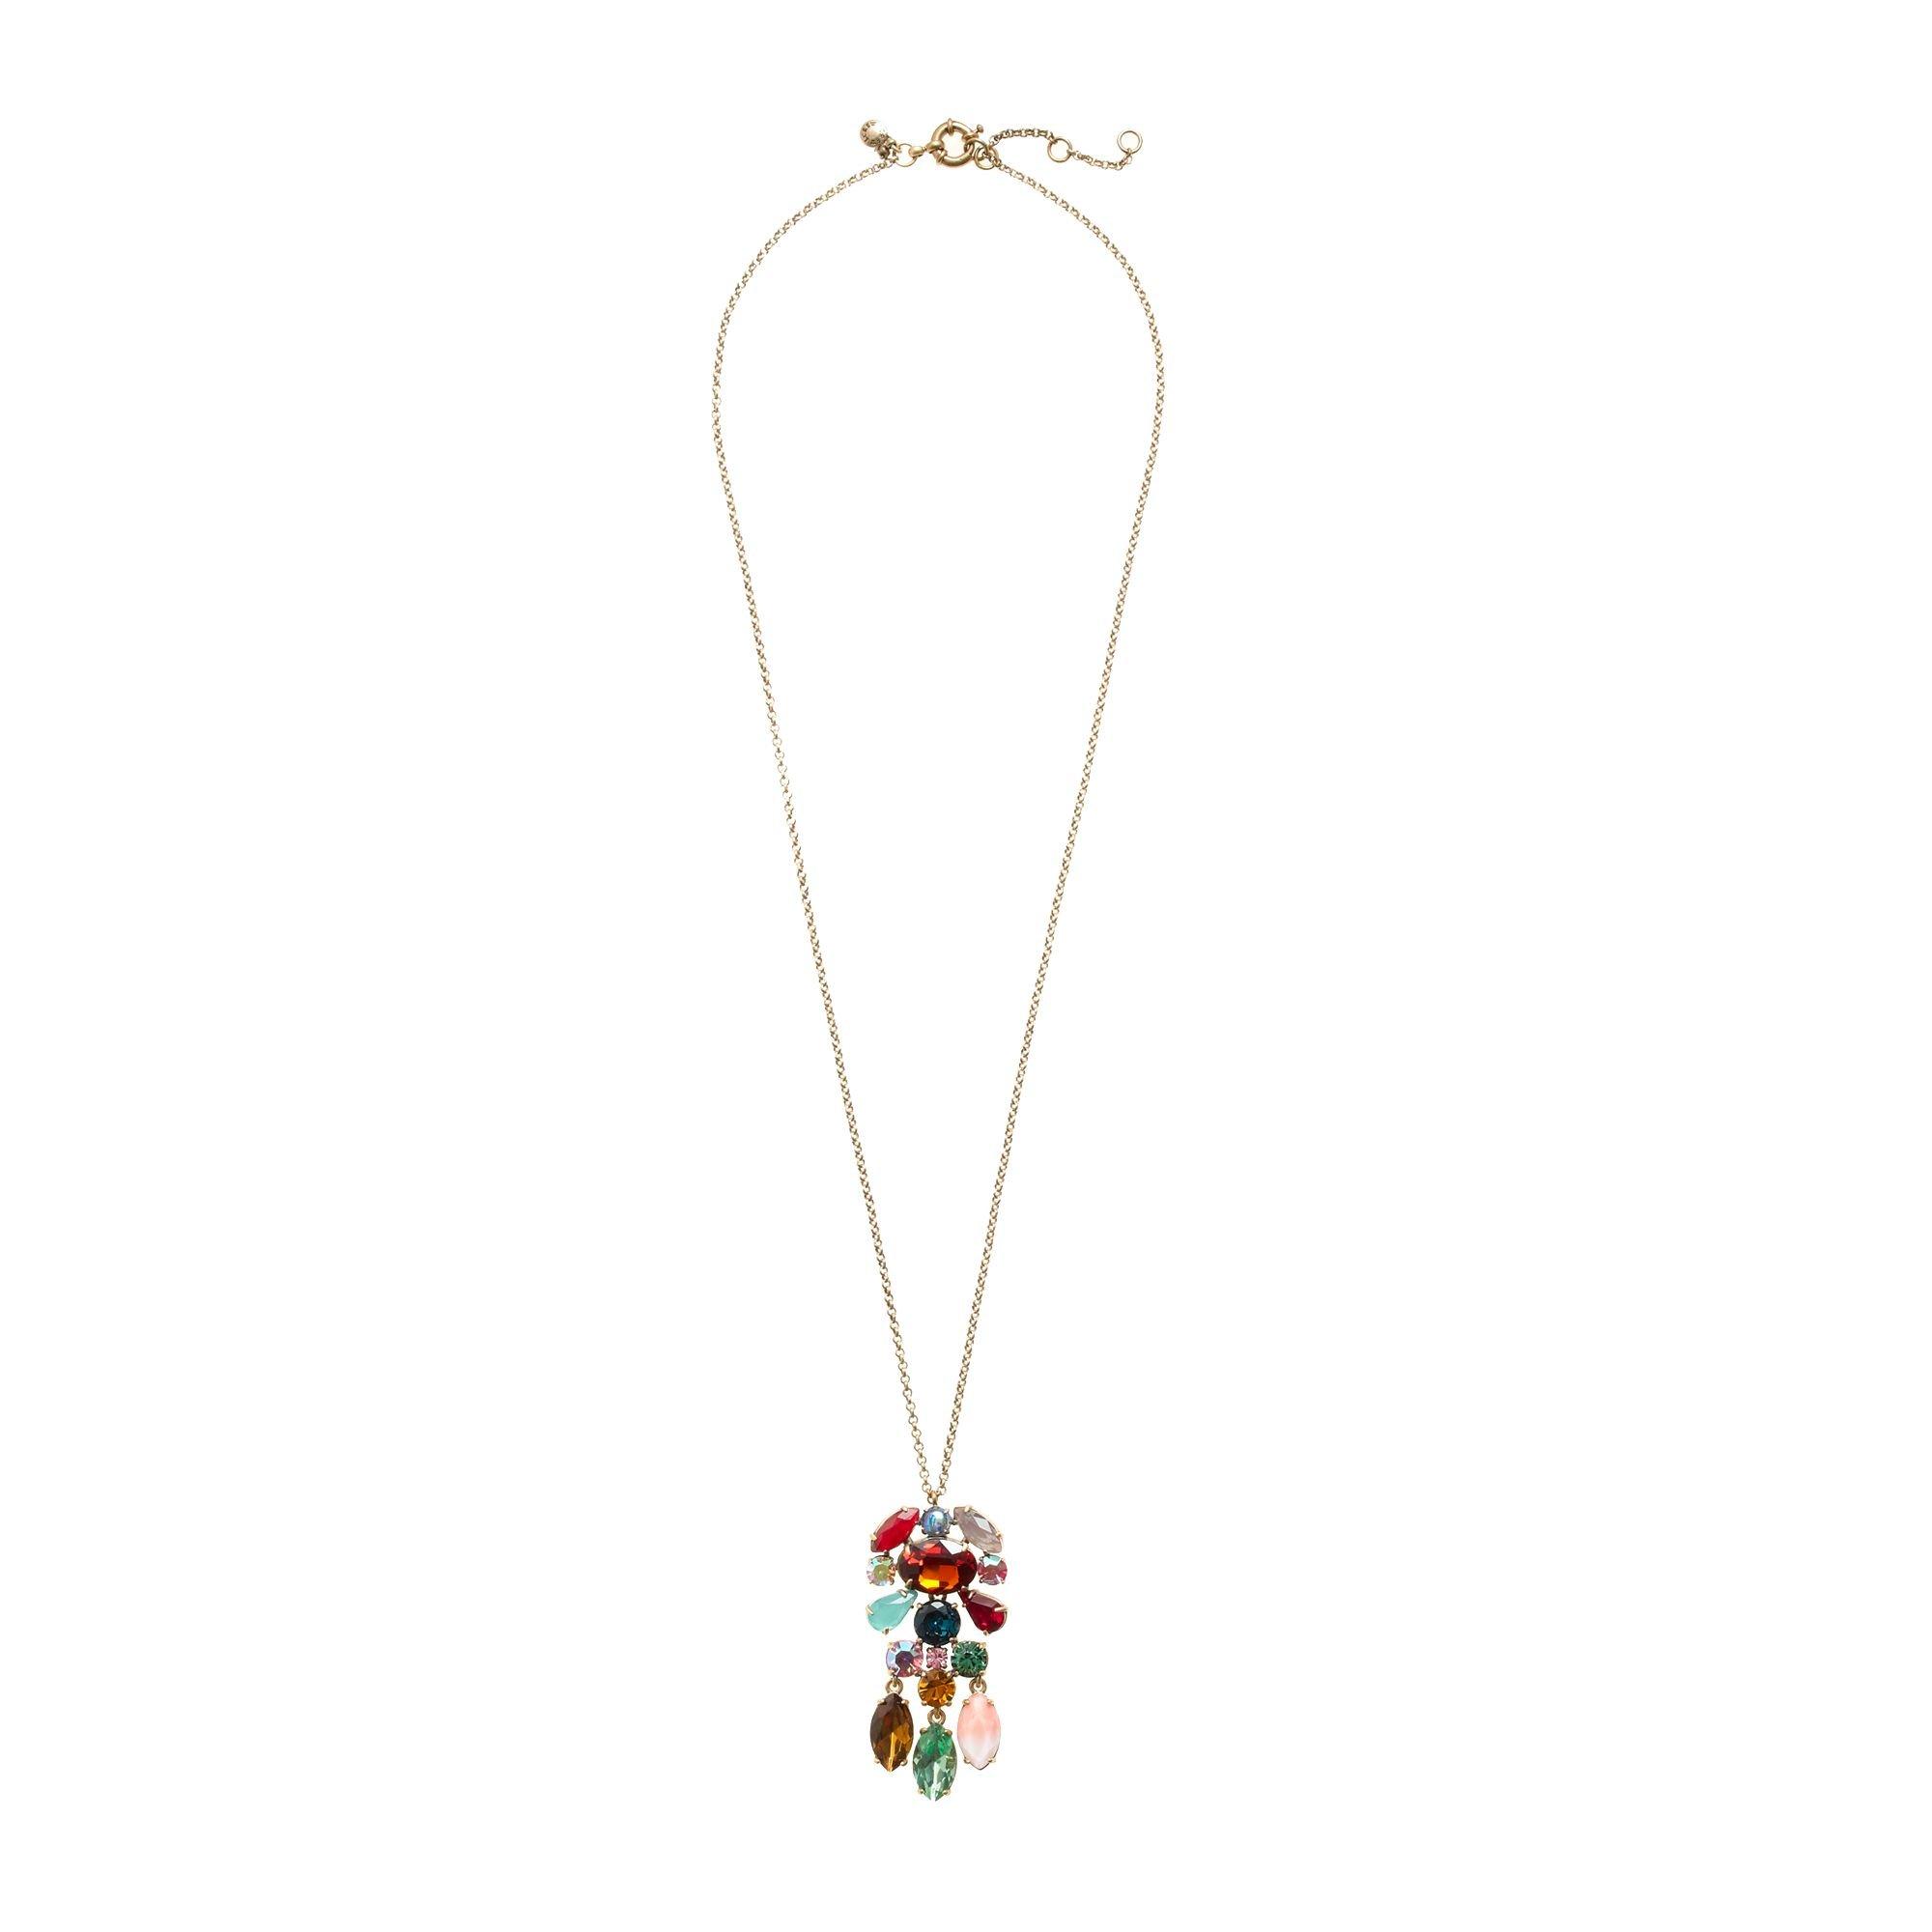 Chandelier Pendant Necklace - Cbaarch.com